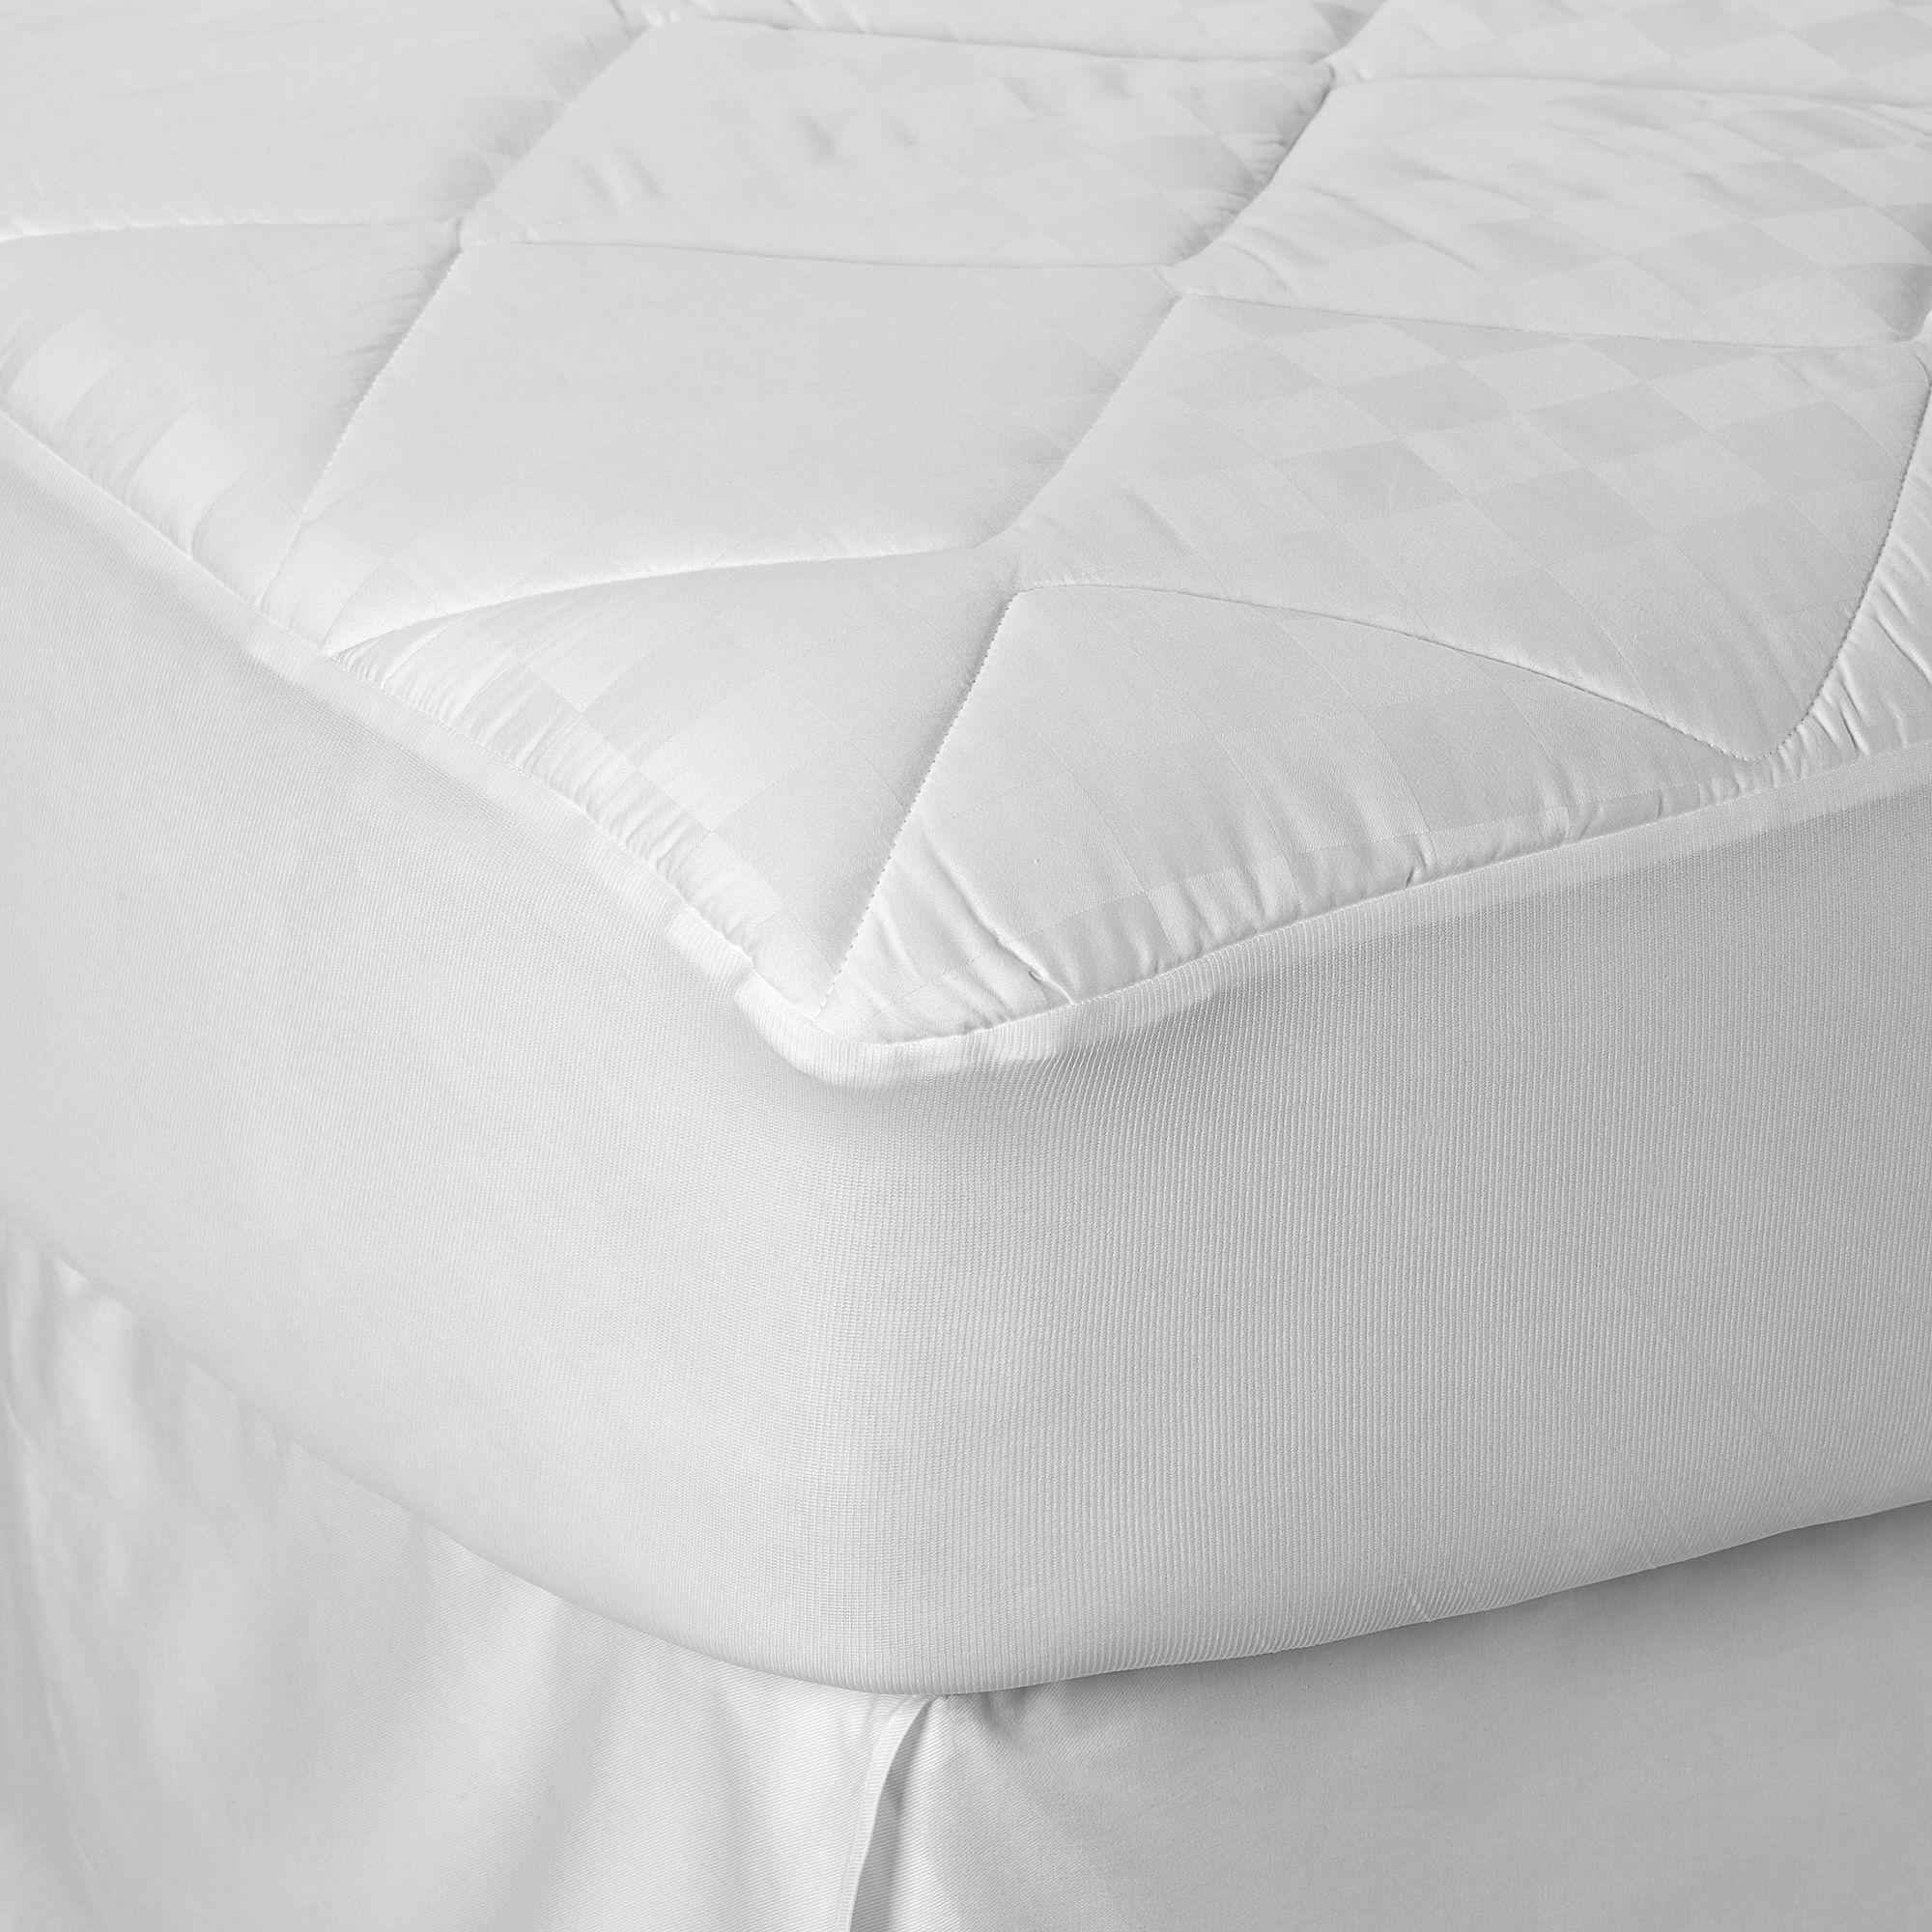 therapedic 300 thread count ultrasoft cotton mattress pad in